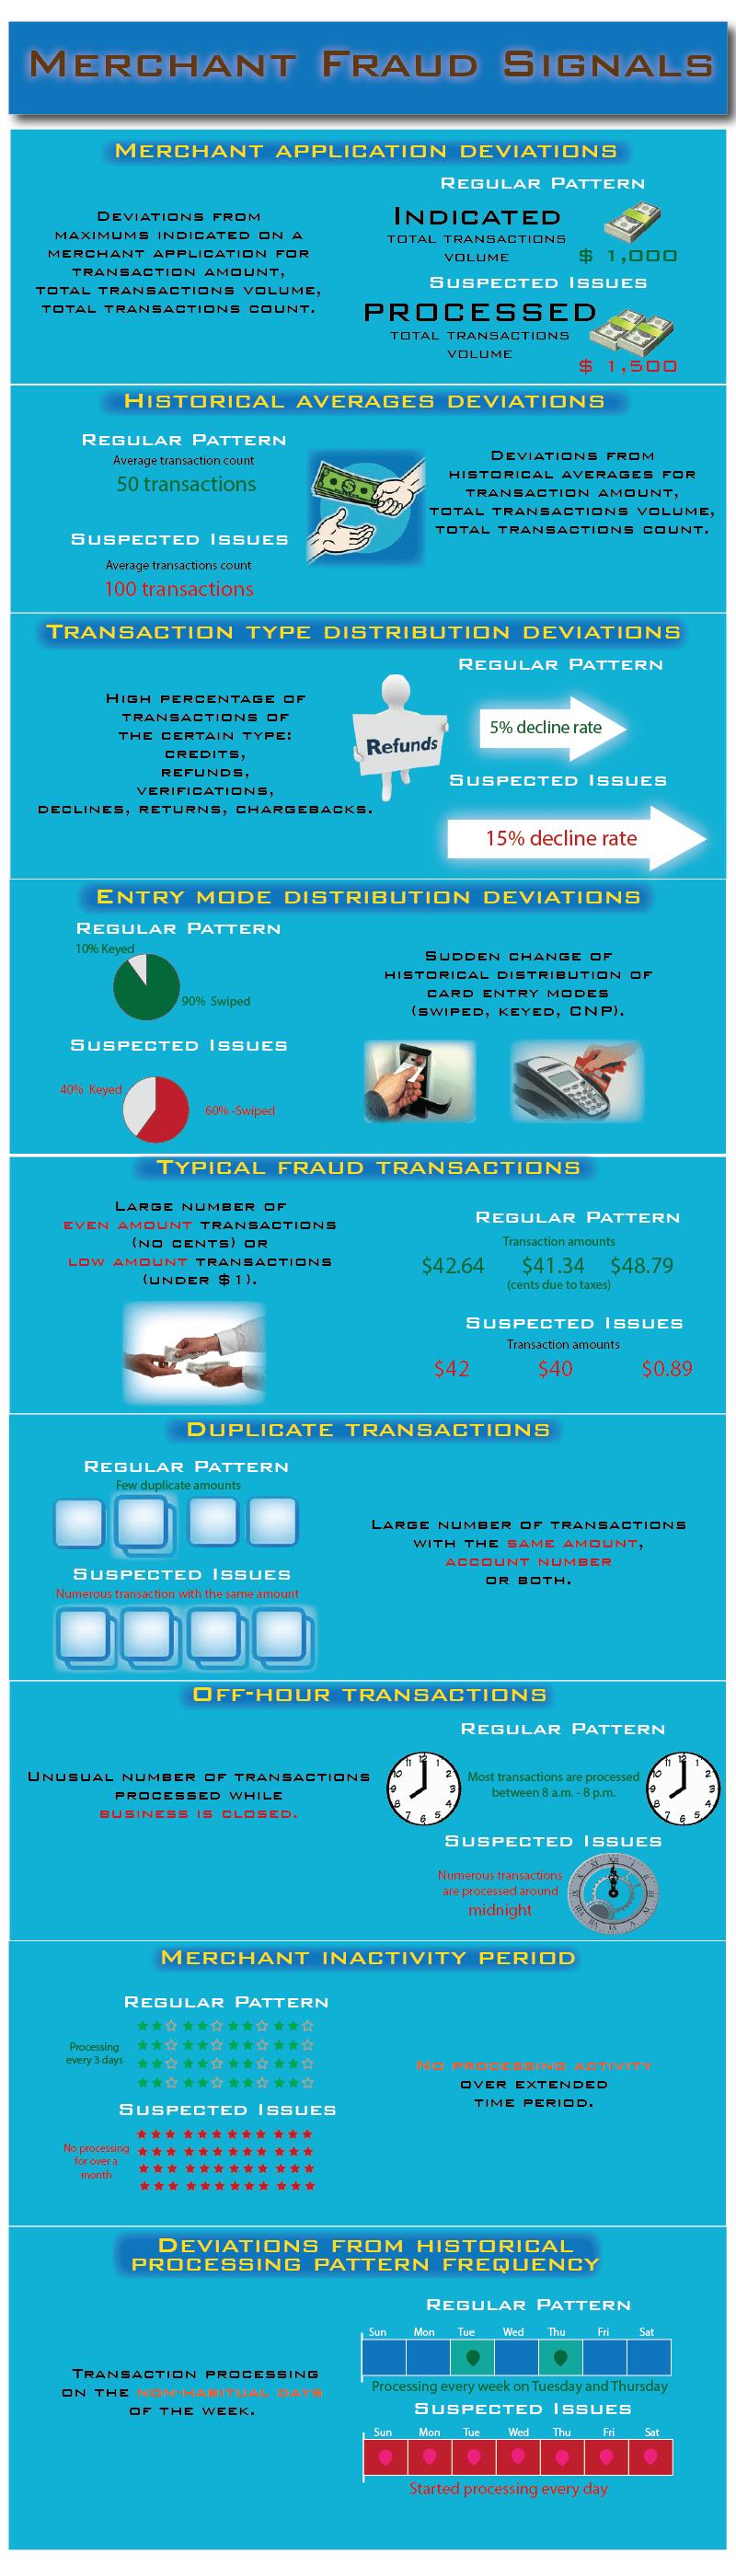 Visualizing Merchant Fraud Signals